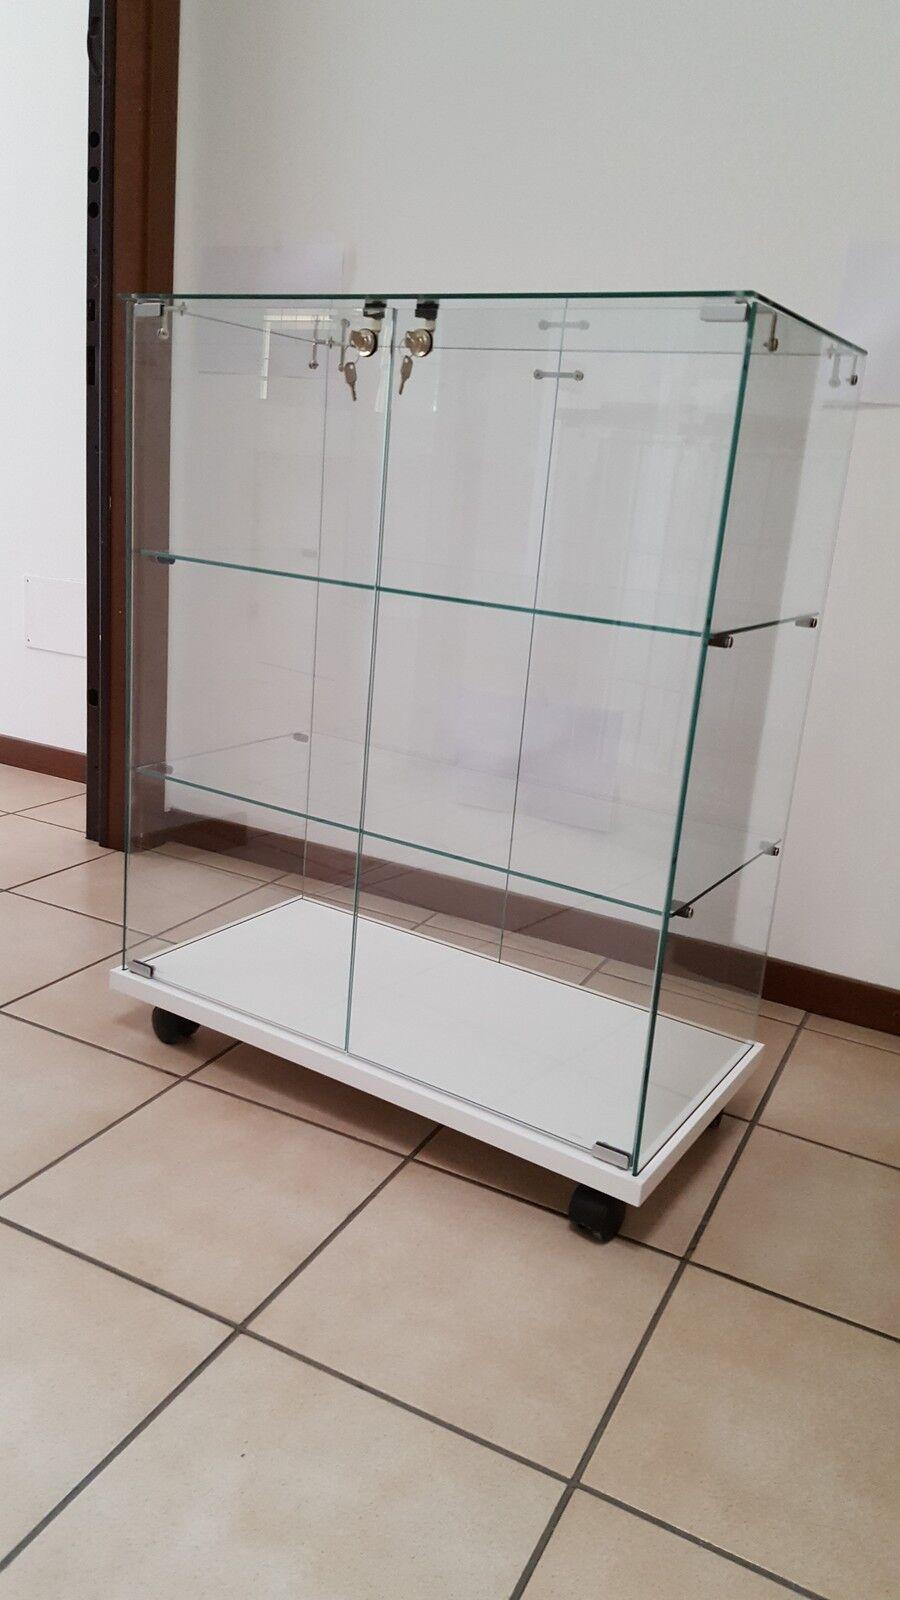 Vitrines pour les collections,vitrine,vitrine en verre,vitrines modele